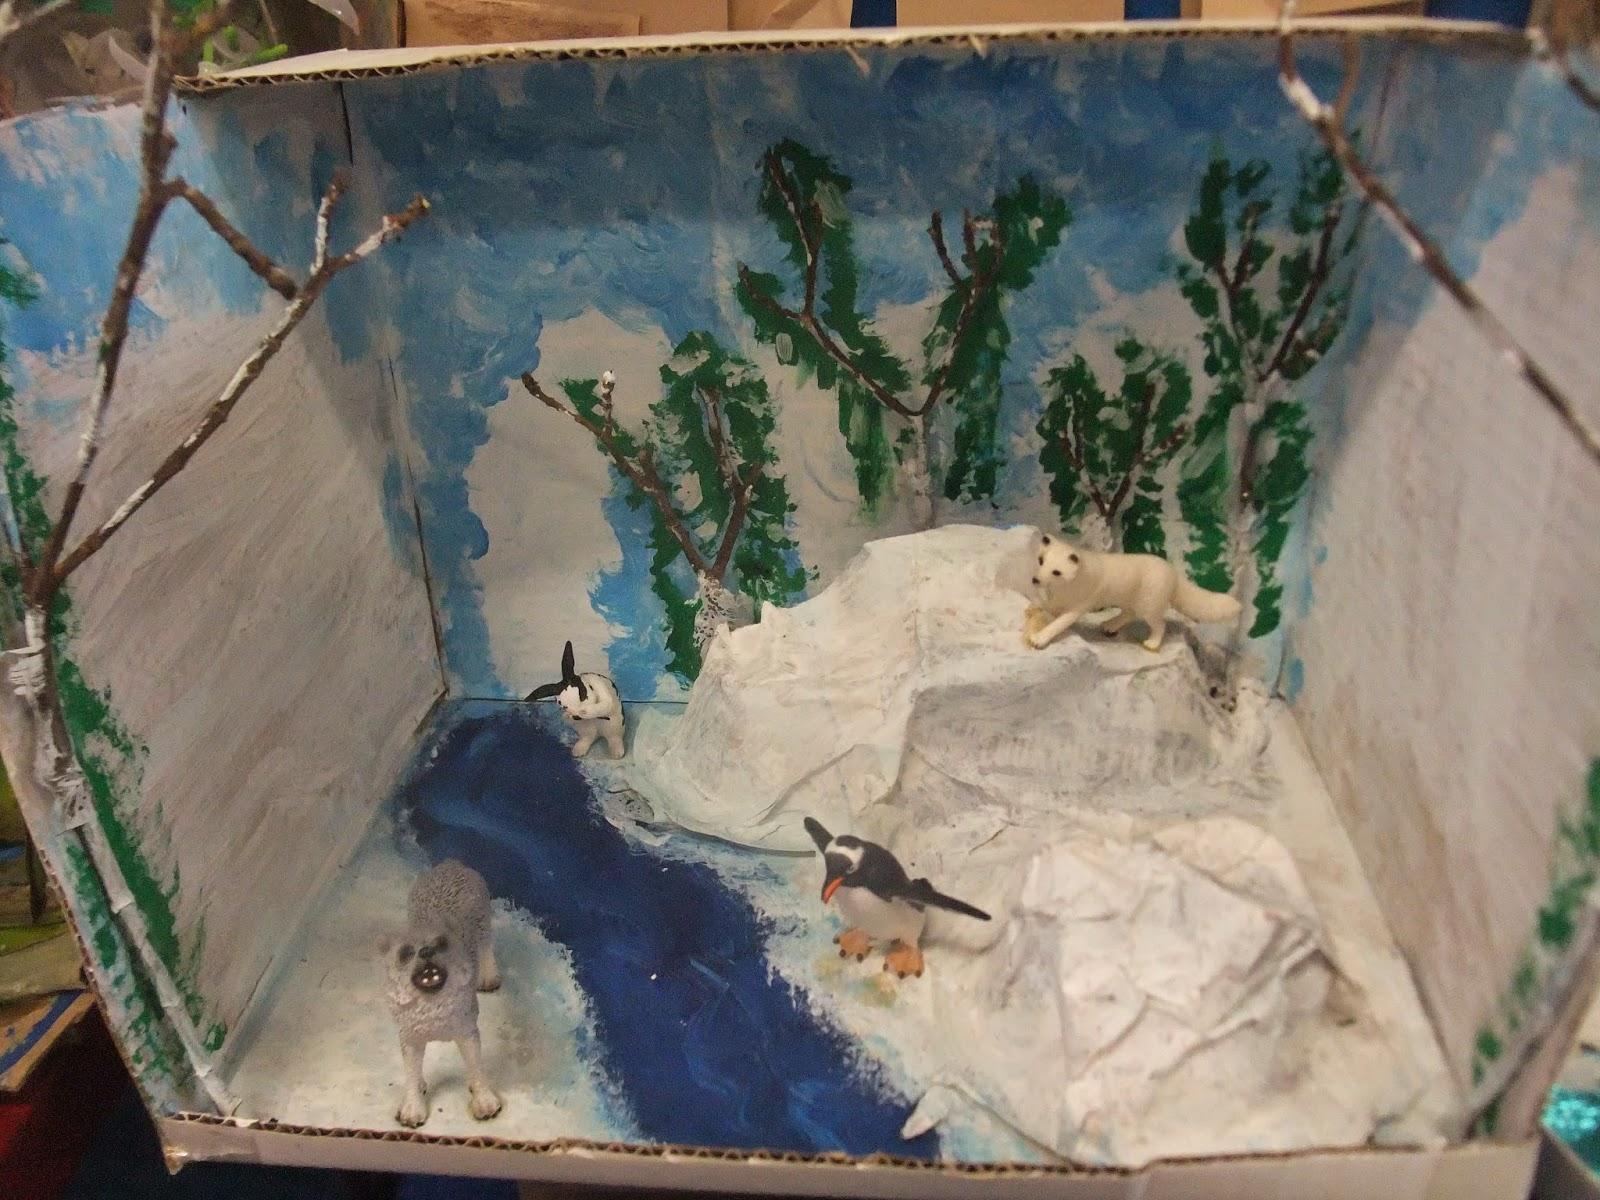 Arctic wolf diorama - photo#2